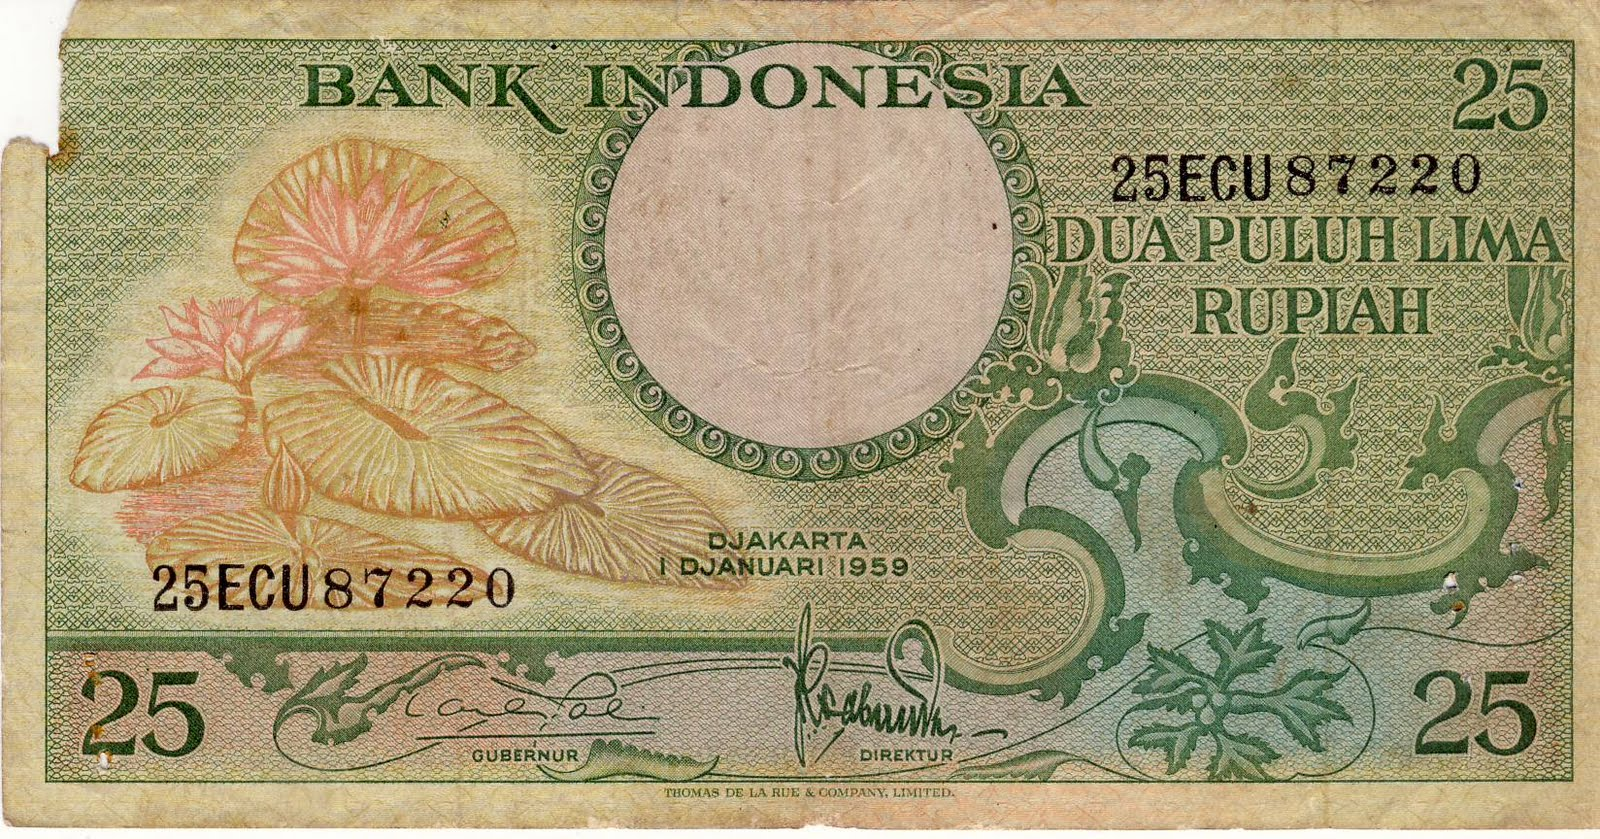 Uang Kuno Indonesia Pecahan Rp  Dua Puluh Lima Rupiah Keluaran  Cetakan Thomas De La Rue Company Limited